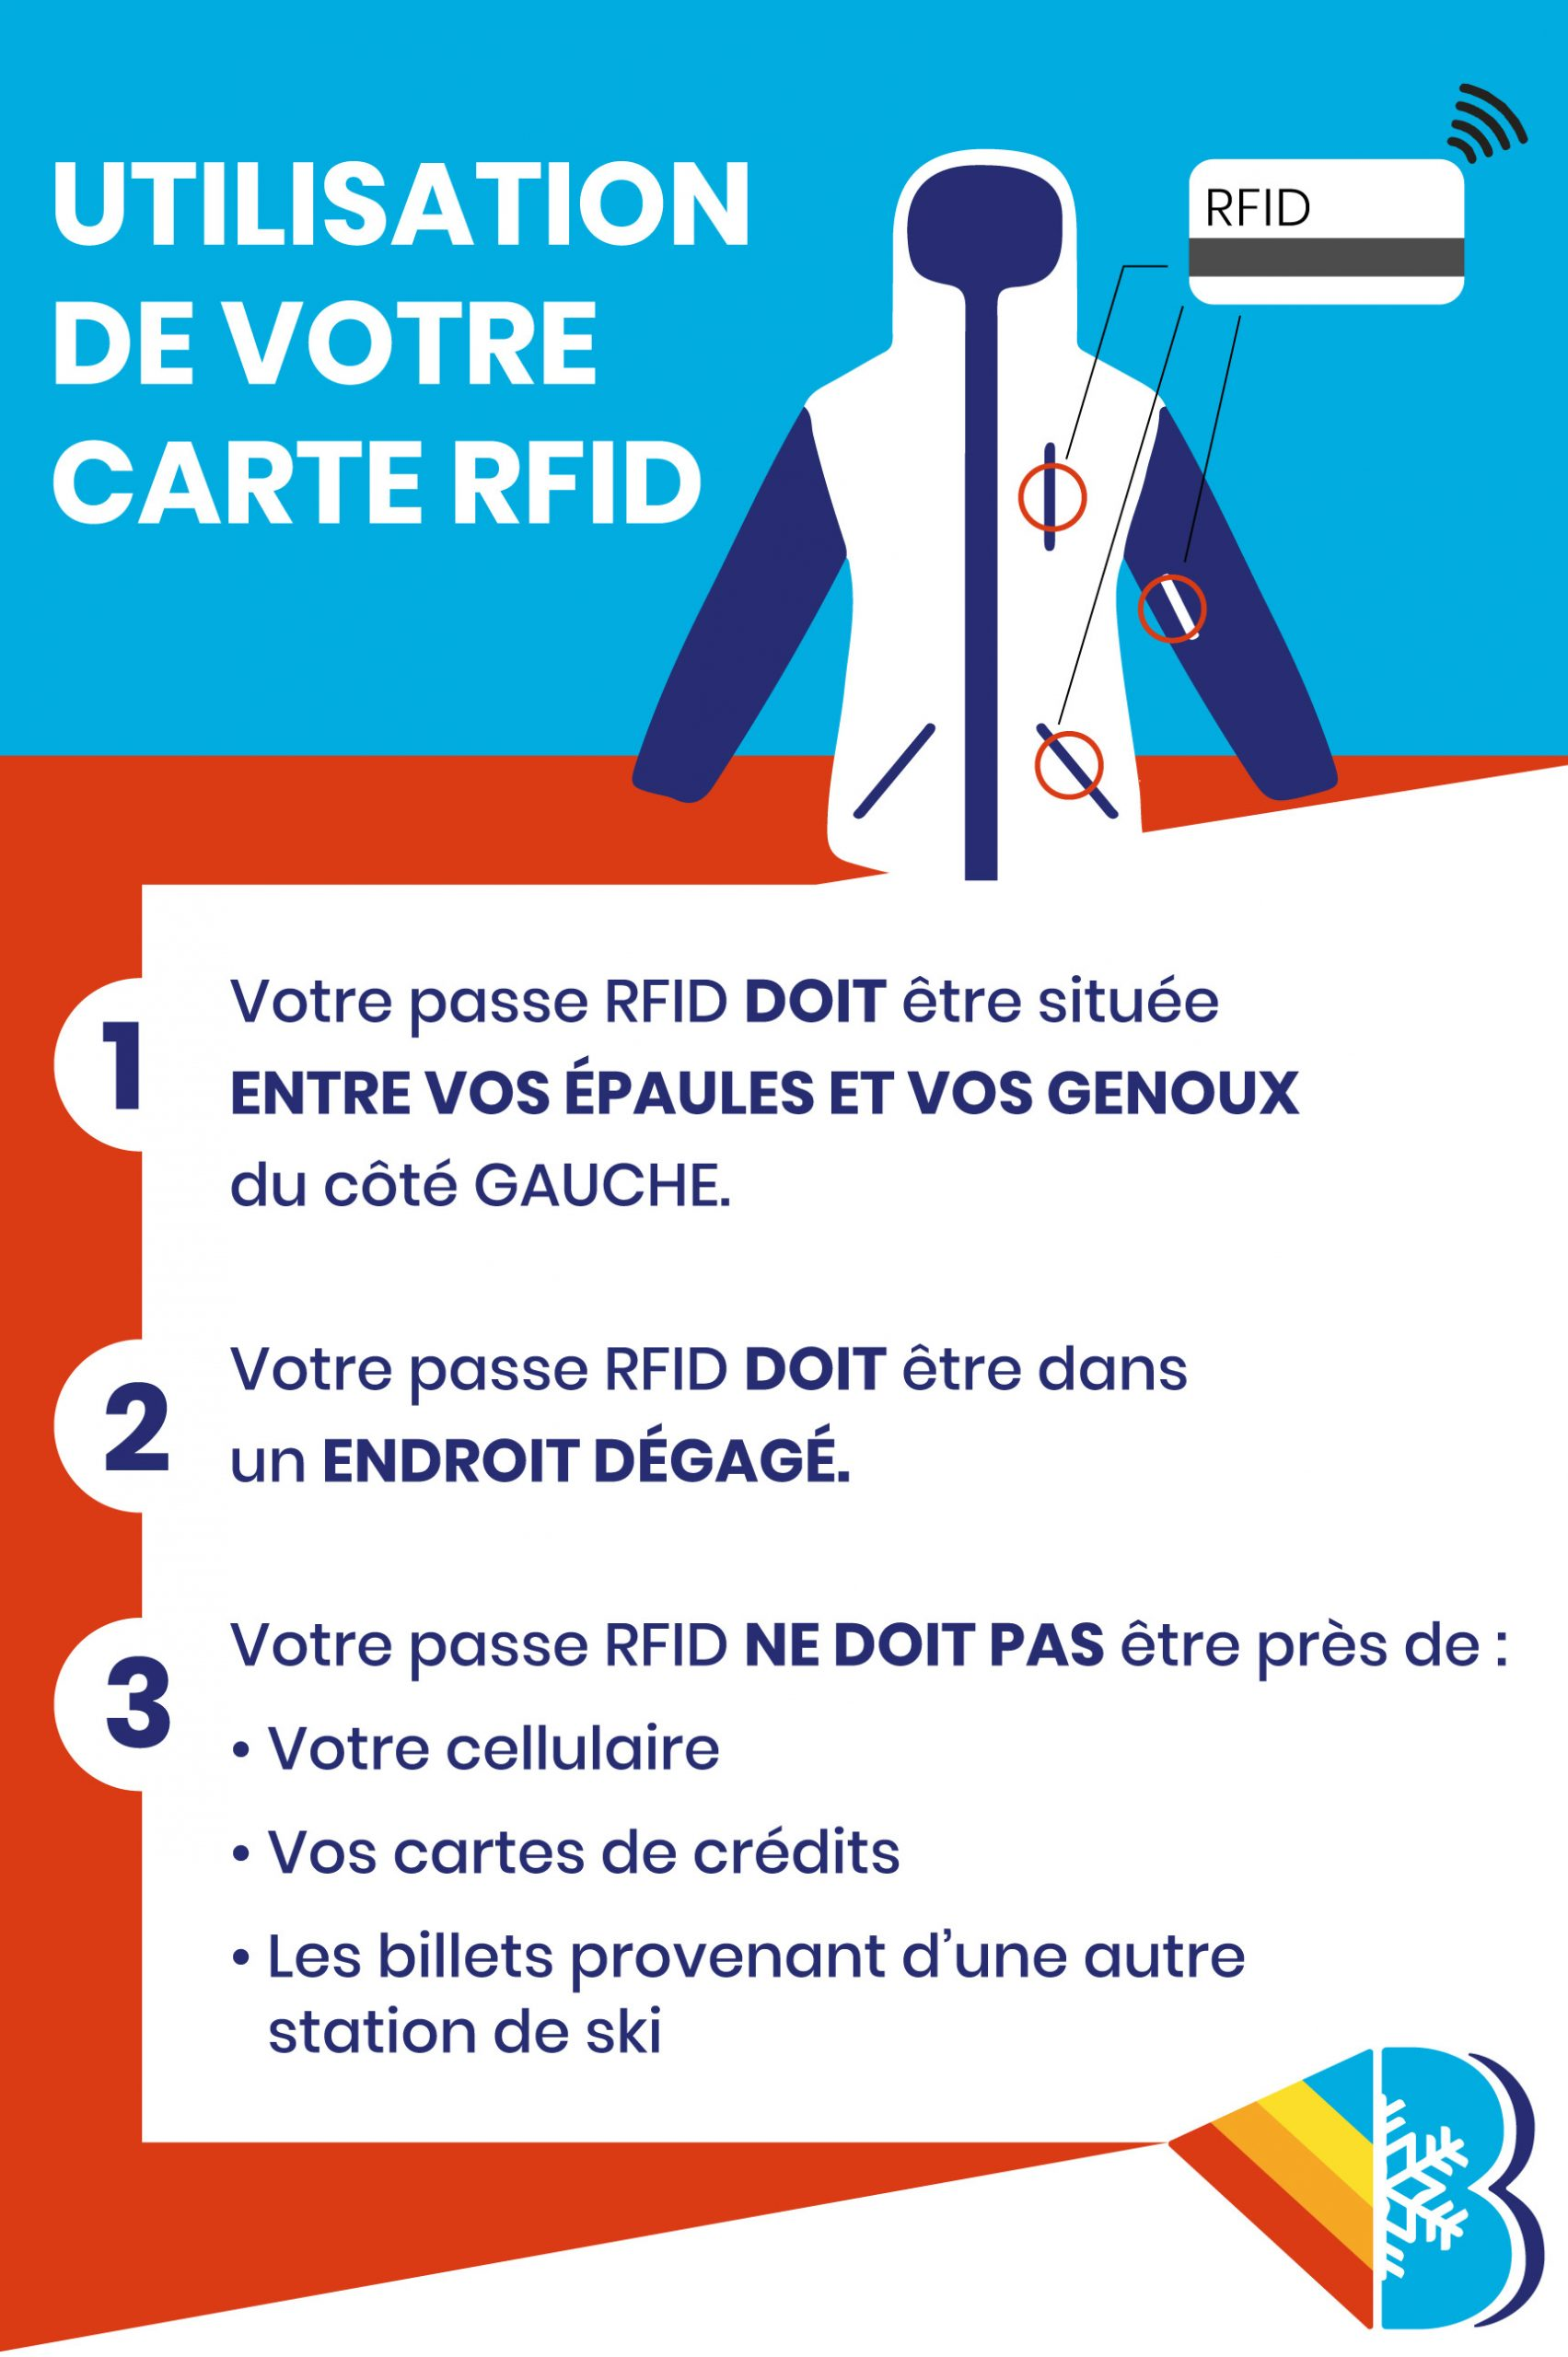 Comment utiliser la passe RFID